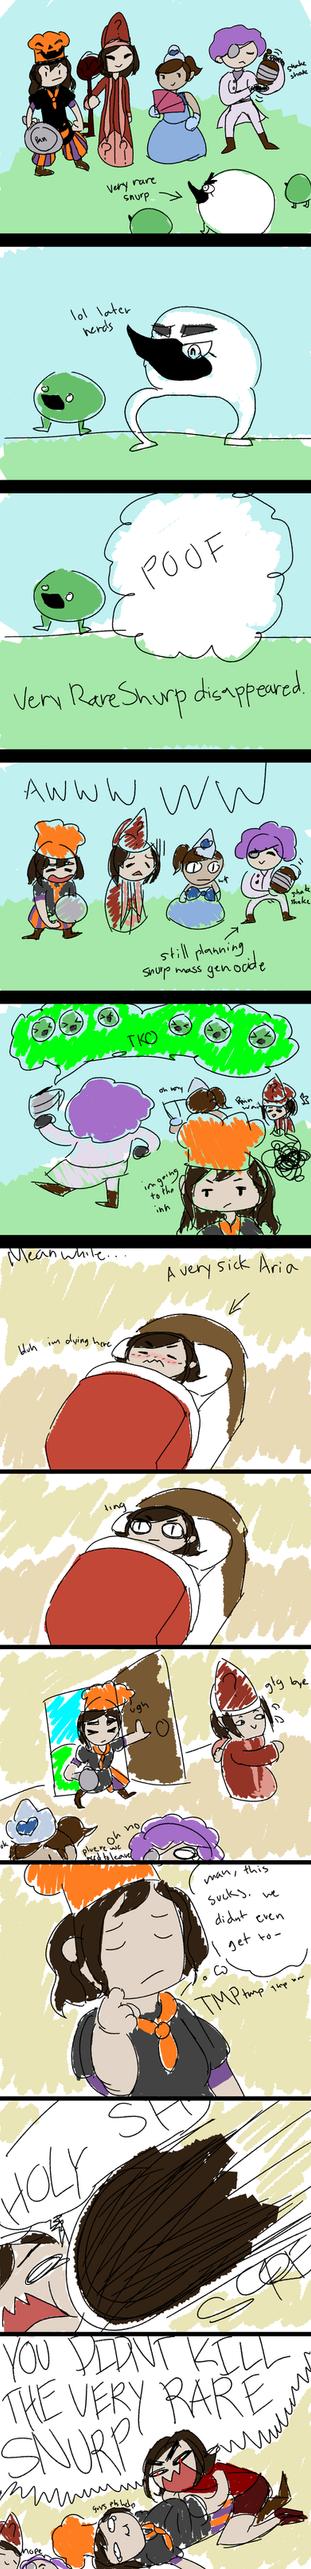 (Slight Miitopia spoilers) The Very Rare Snurp by RainstormArt